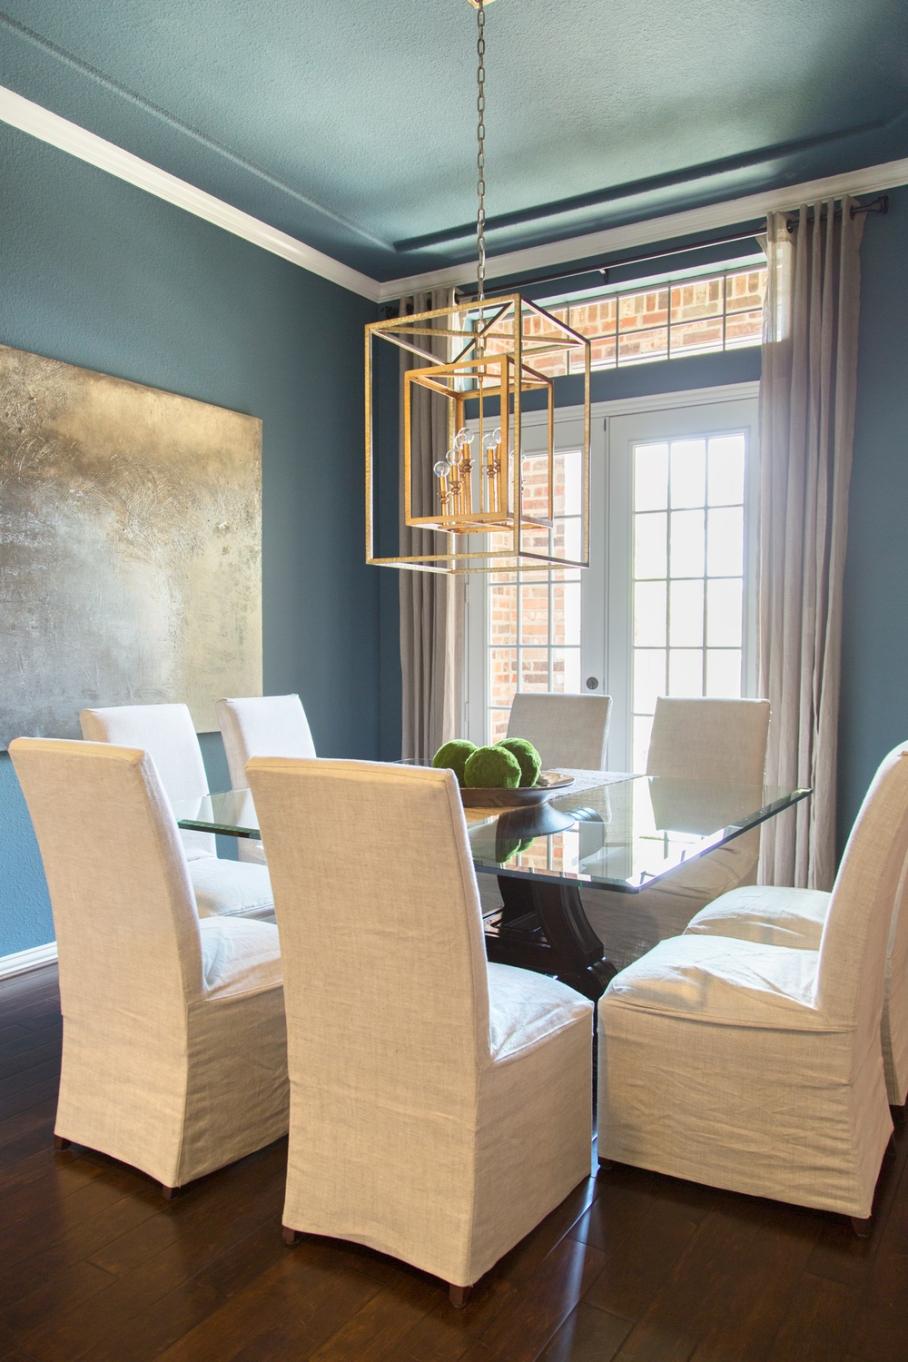 Dining room remodel; table;art; gilded lantern; decor | Interior Designer: Carla Aston / Photographer: Tori Aston